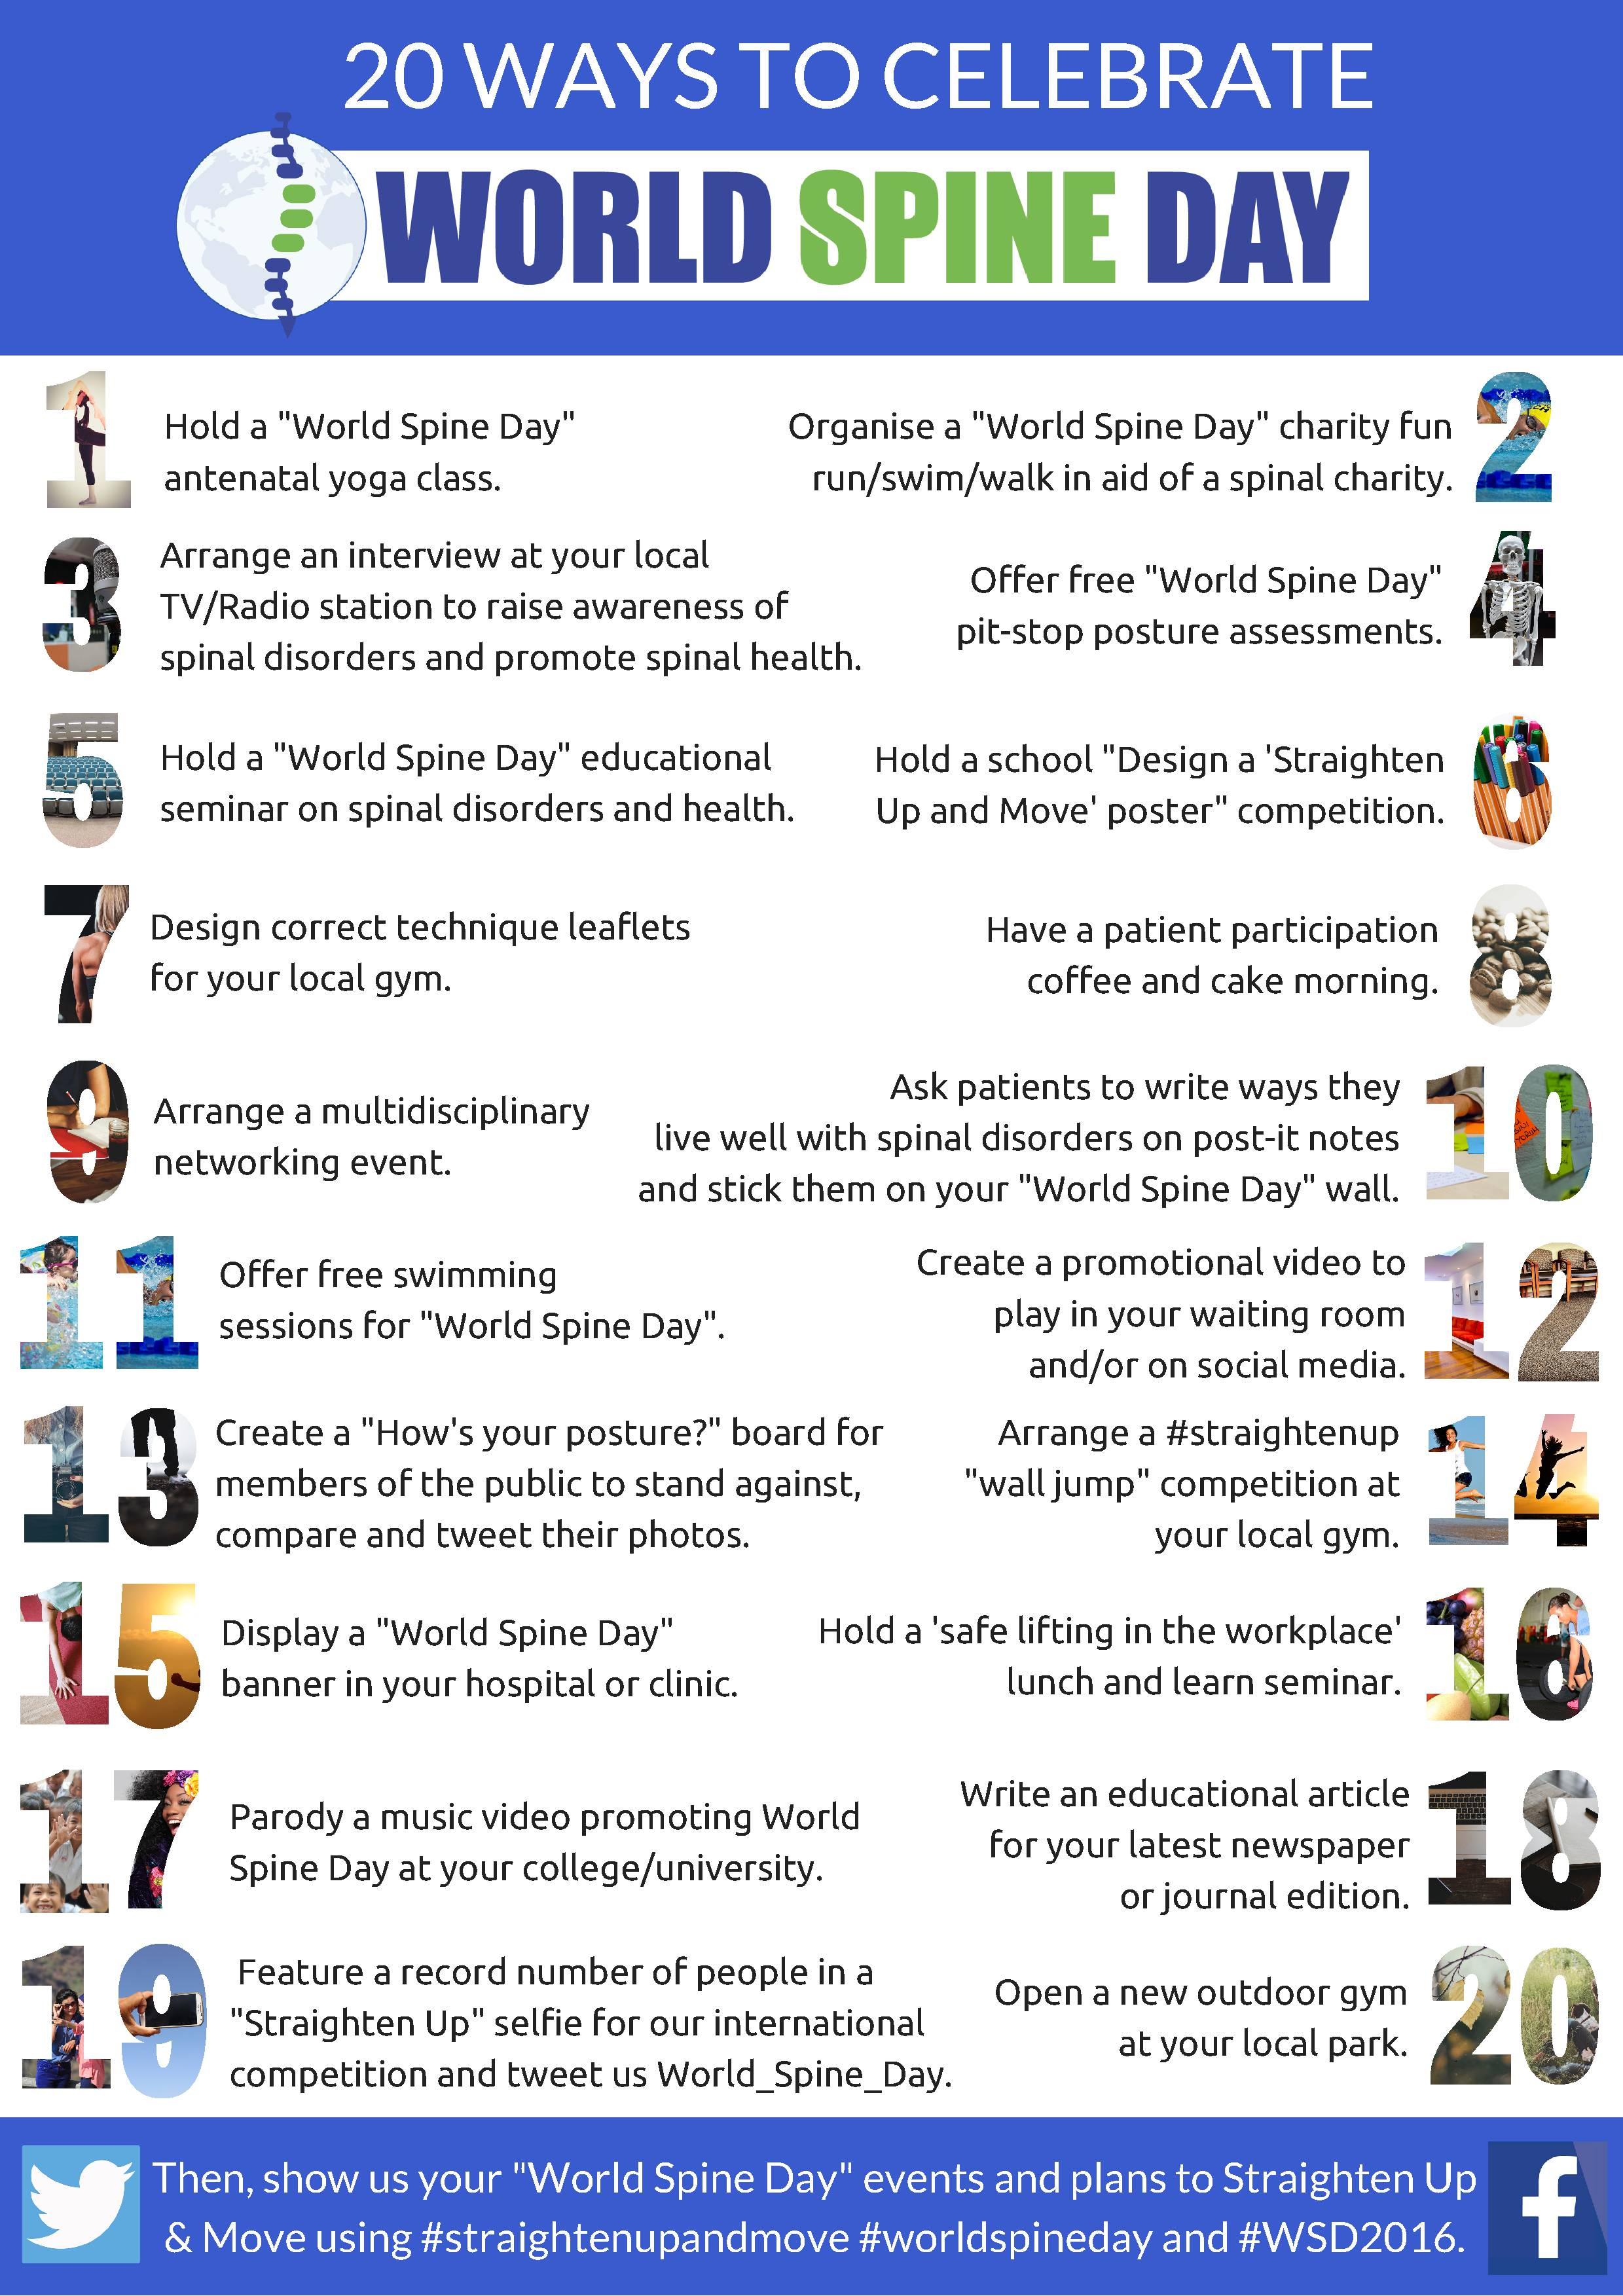 20 Ways To Celebrate World Spine Day